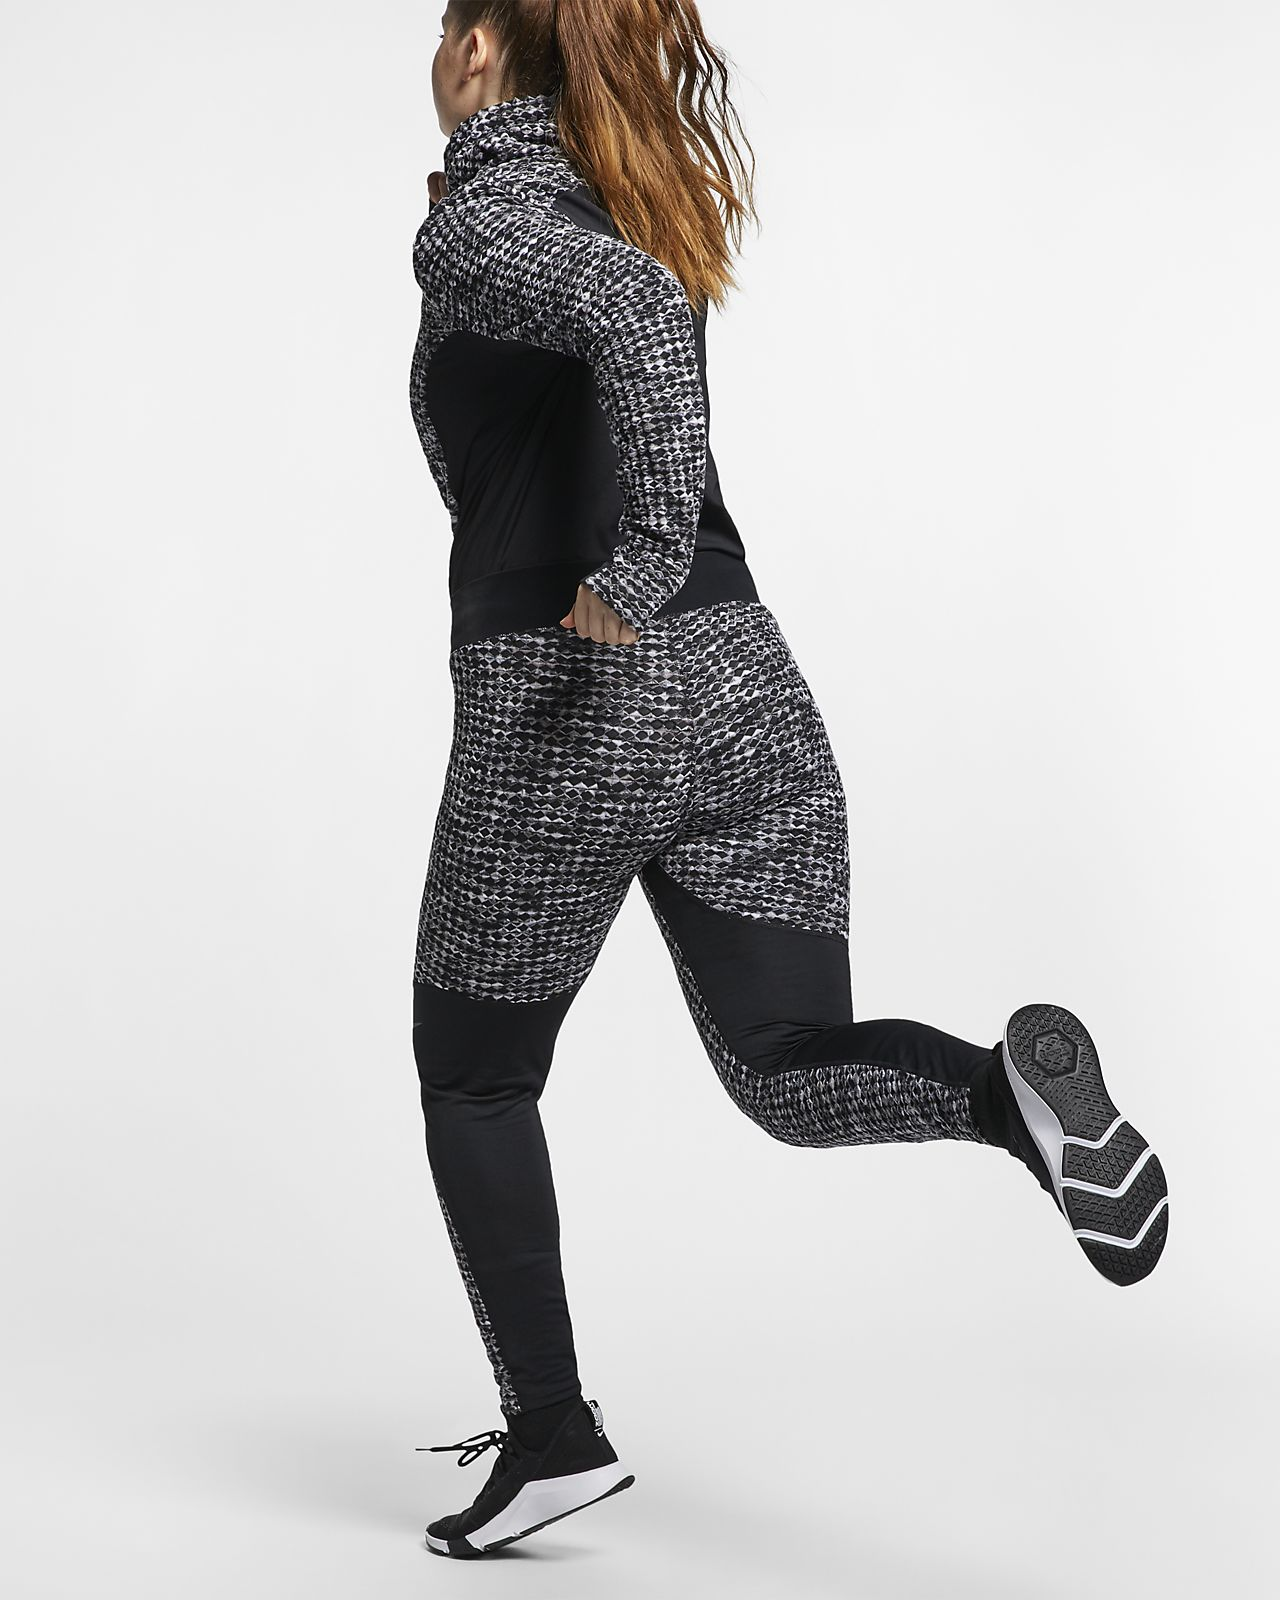 dccc18964a37c Nike Pro HyperWarm (Plus Size) Women's Tights. Nike.com AU